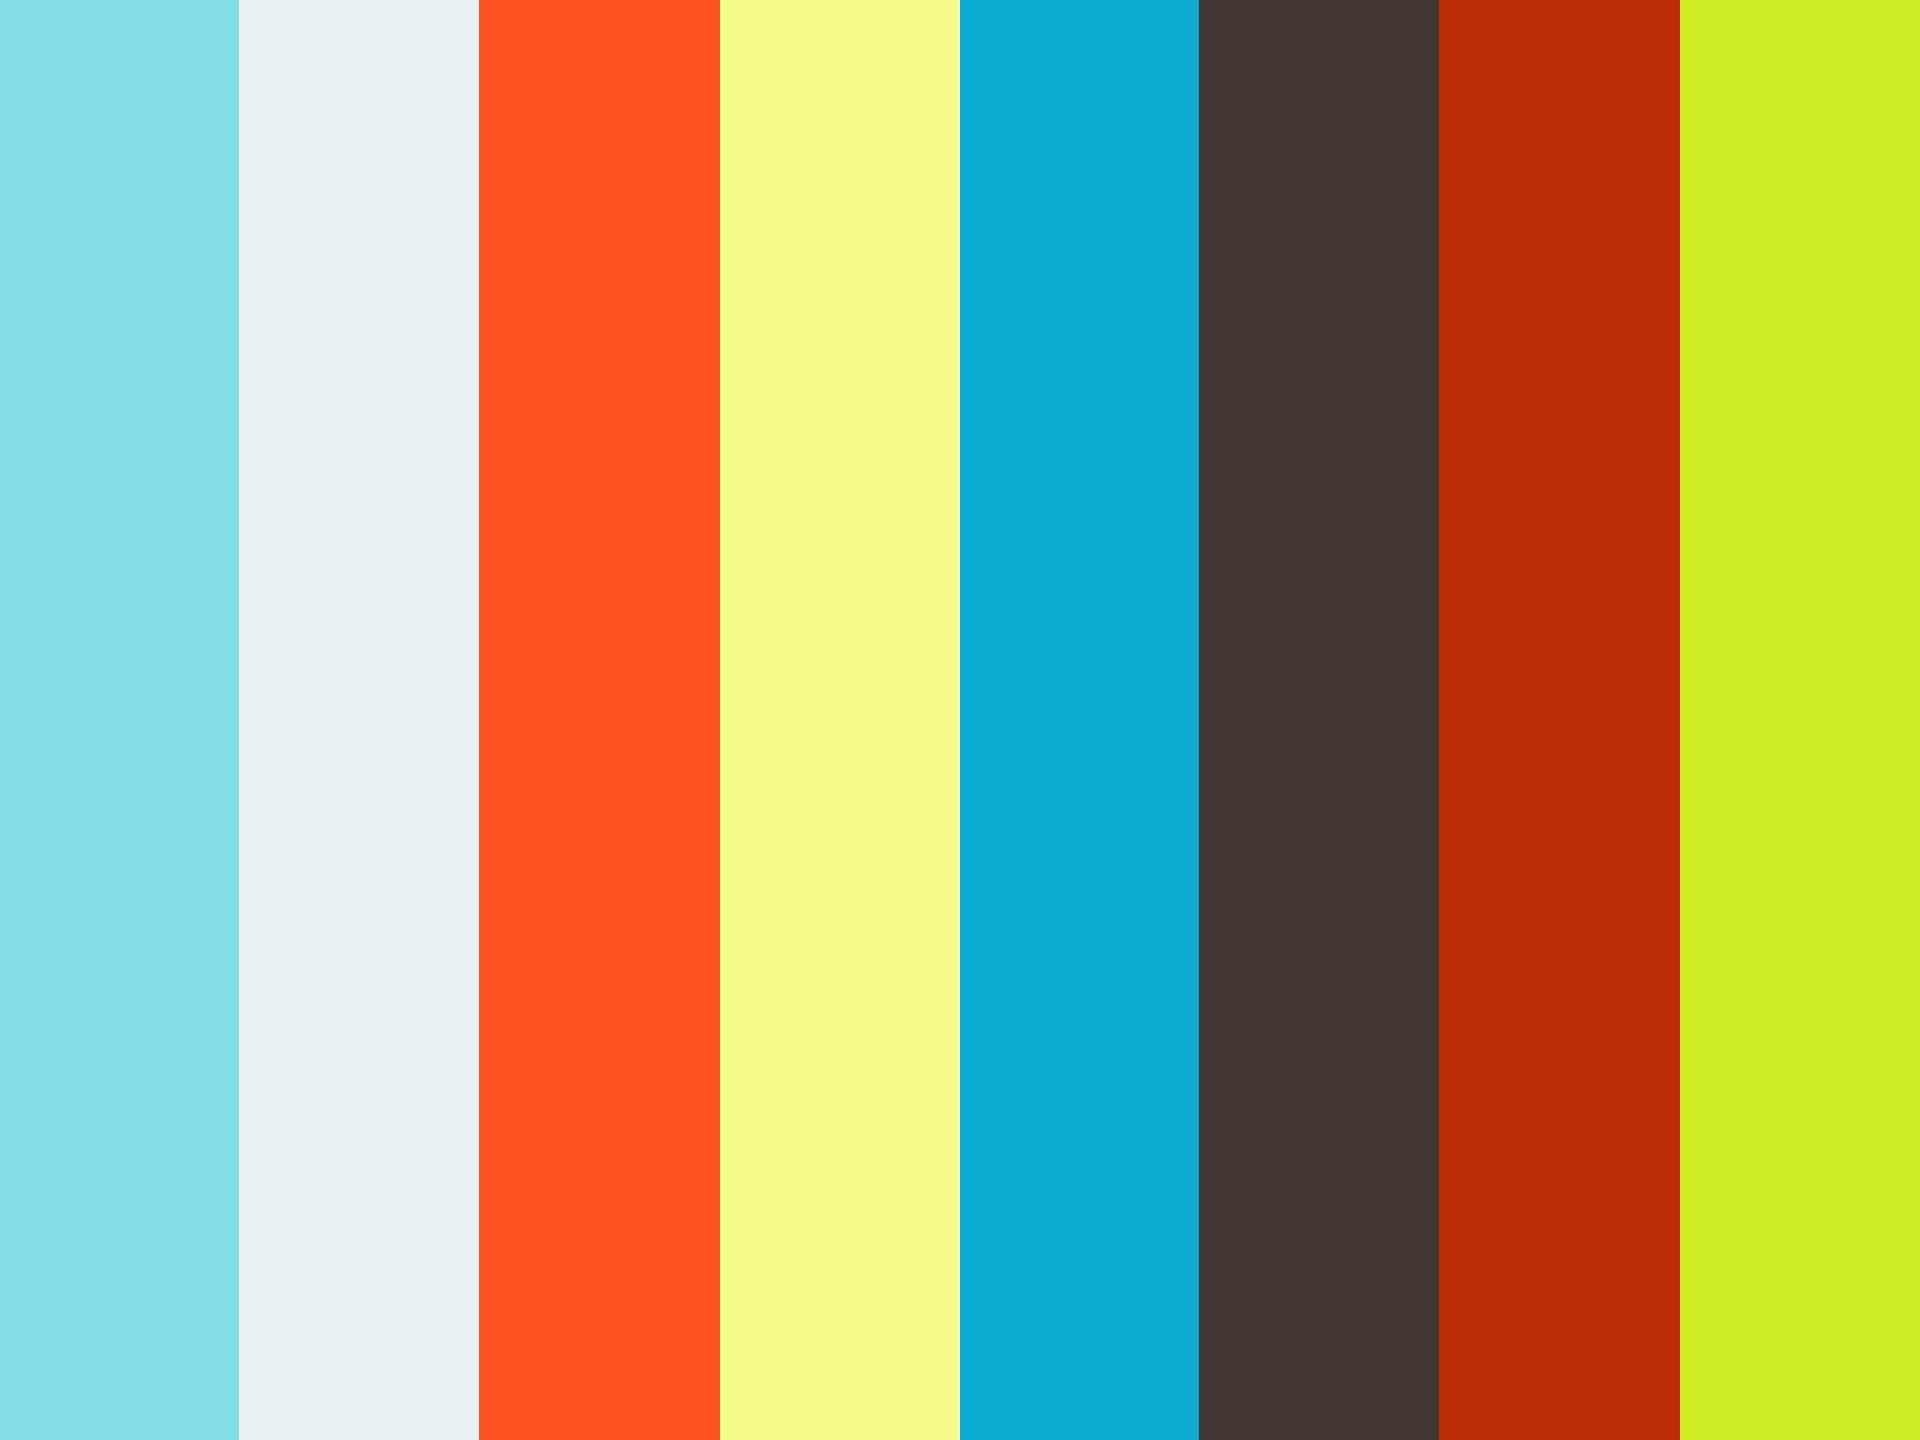 IPS e.max ジルキャド MT マルチ チェアサイドブロック草間幸夫先生によるビデオセミナー 【全10動画】 #10 まとめ